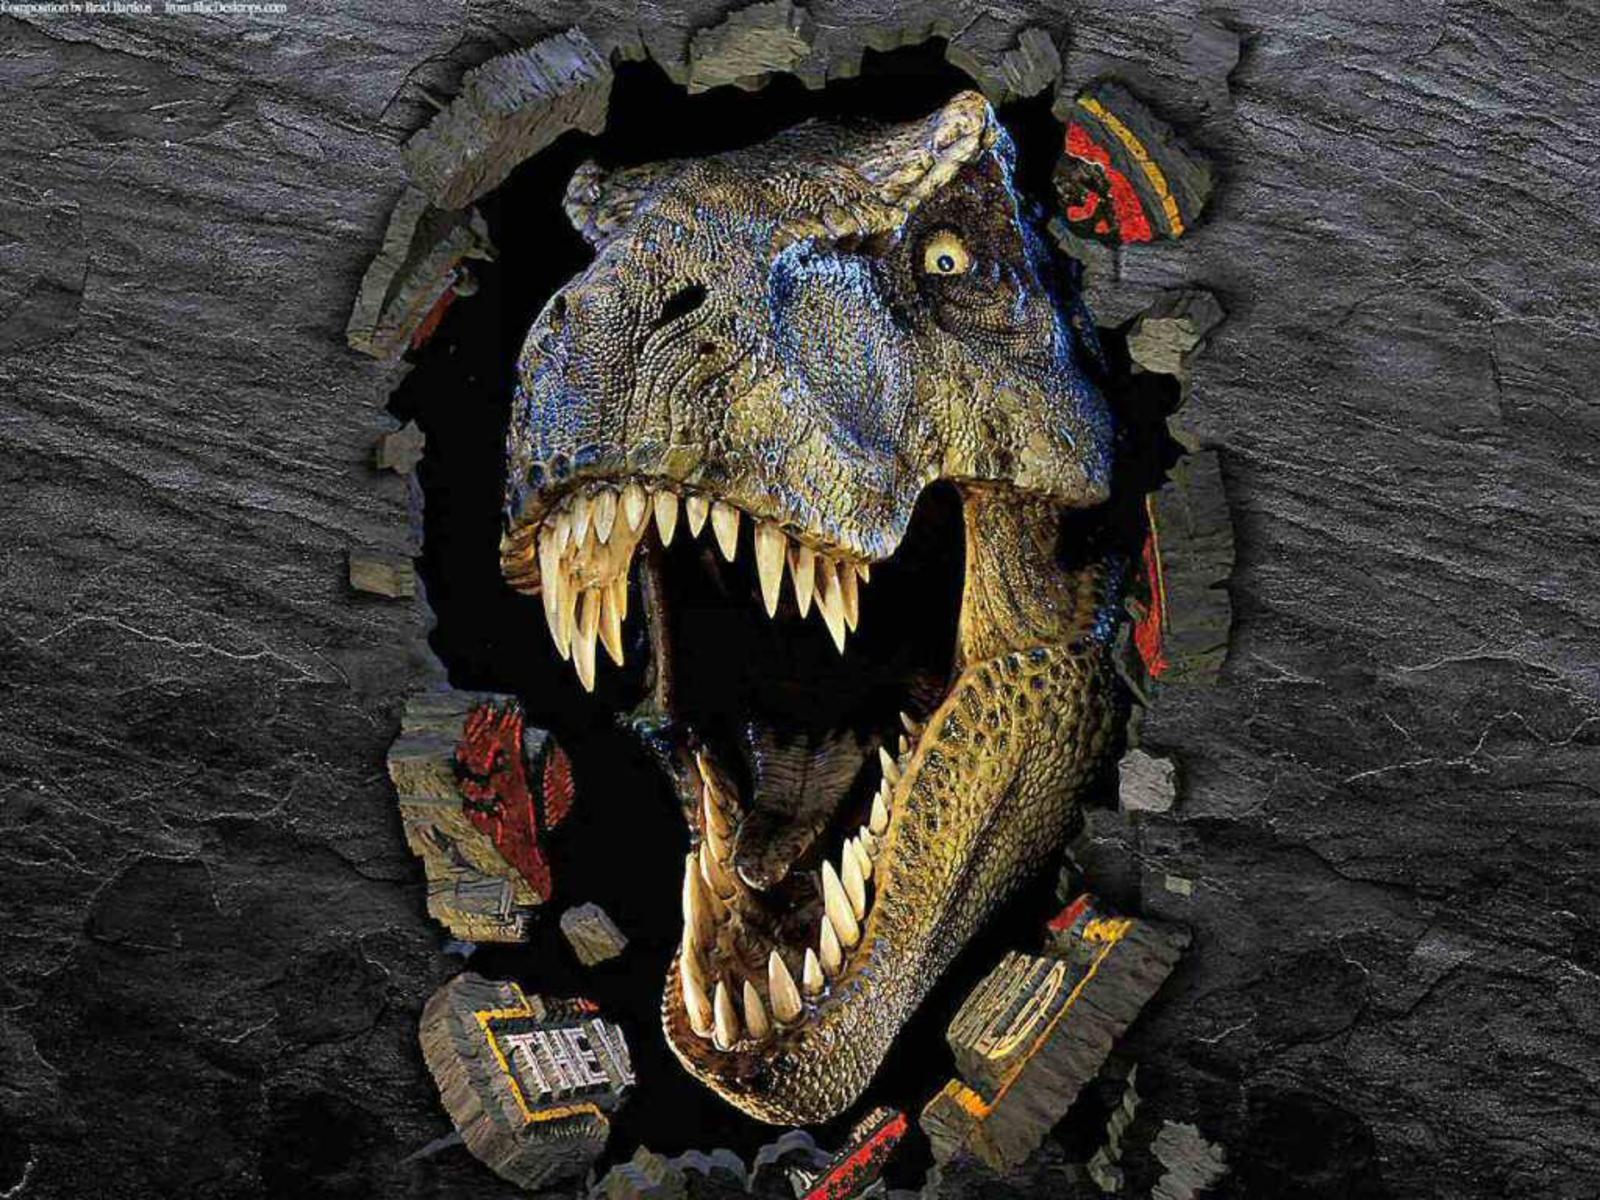 Wallpapers De T rex   wallpaper animal hd 1600x1200